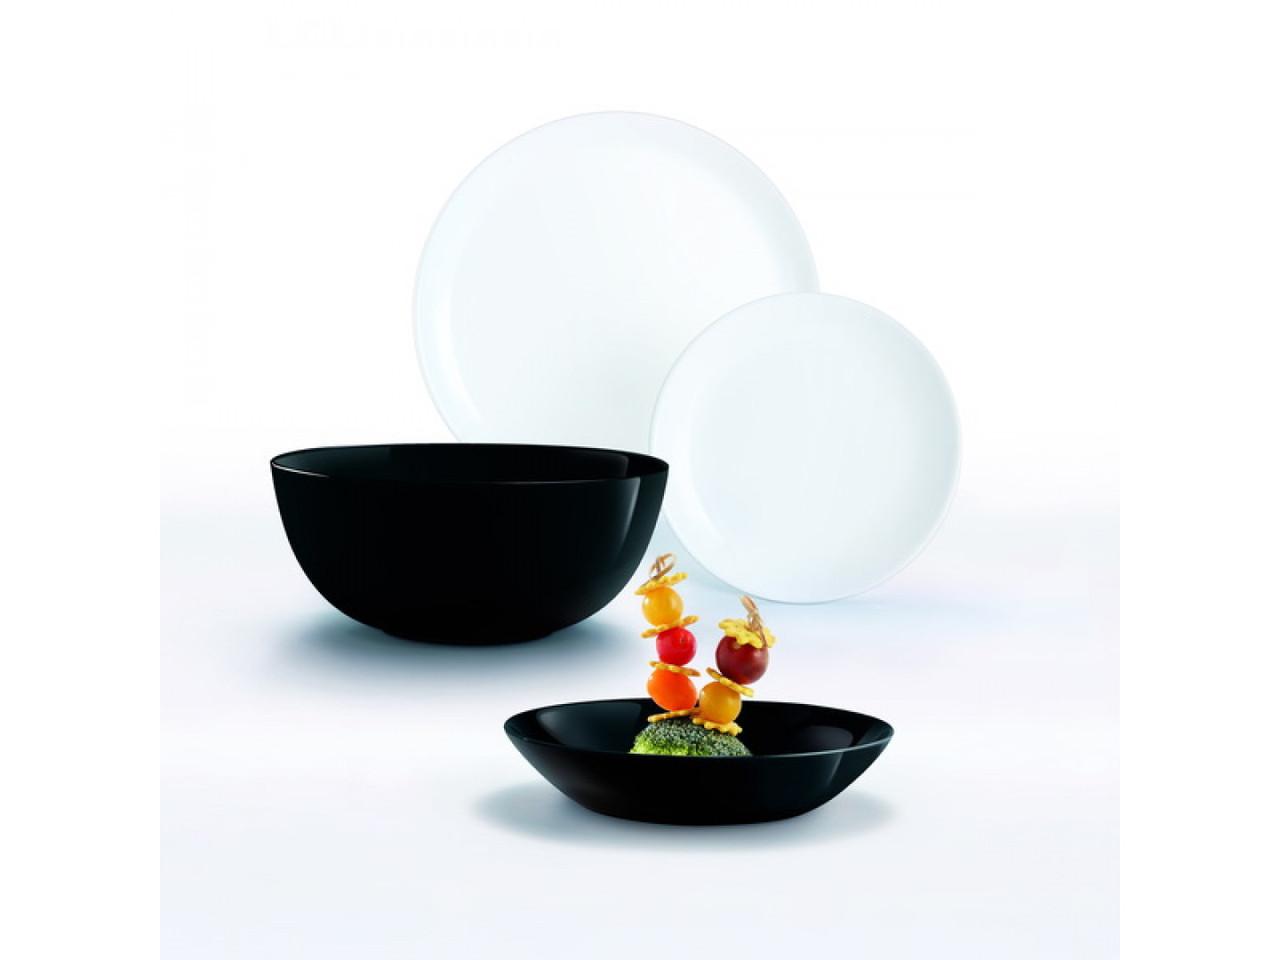 Сервиз Diwali Black&White из 19 предметов на 6 персон